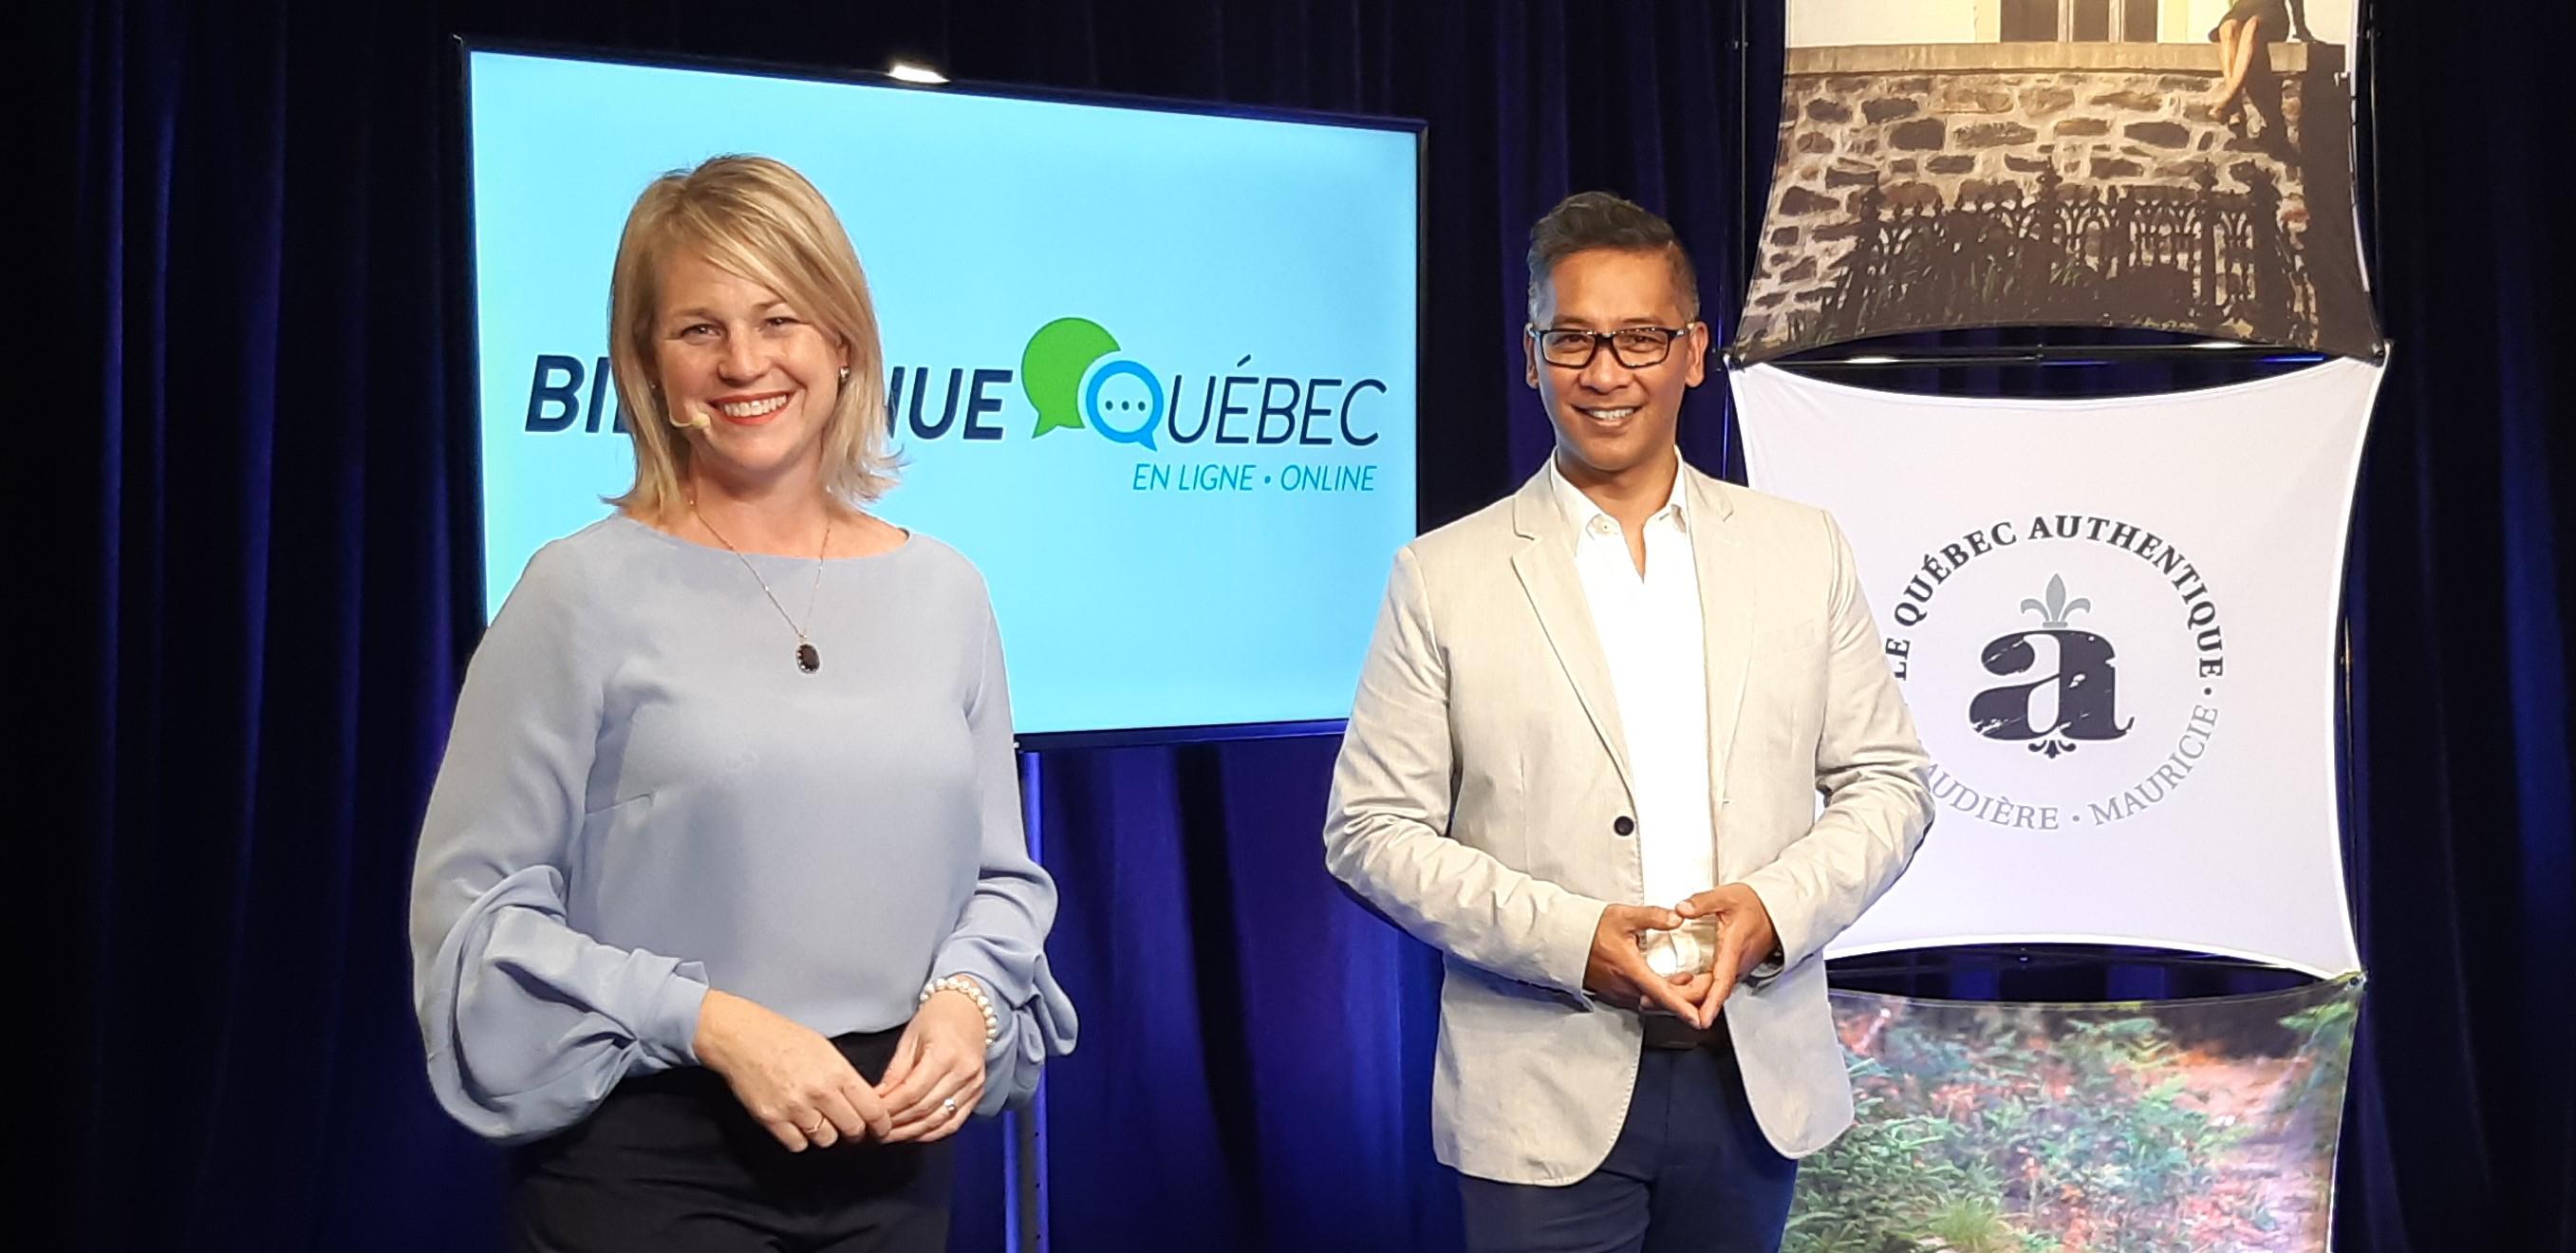 20201026 Eklosion Karina Lehoux et Anthony Horng Bienvenue Québec